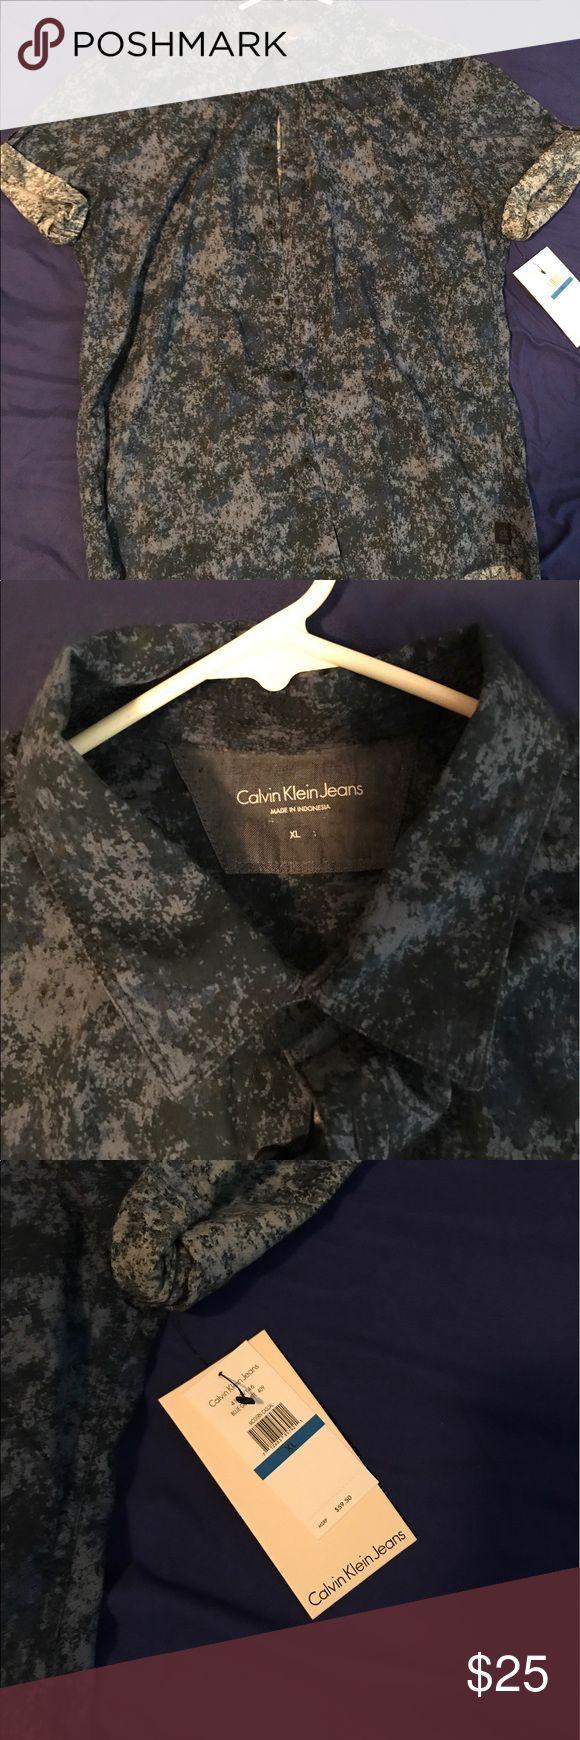 Calvin Klein Navy Camouflage Shirt XL Calvin Klein Navy Camouflage shirt. NWT. Calvin Klein Jeans Shirts Casual Button Down Shirts